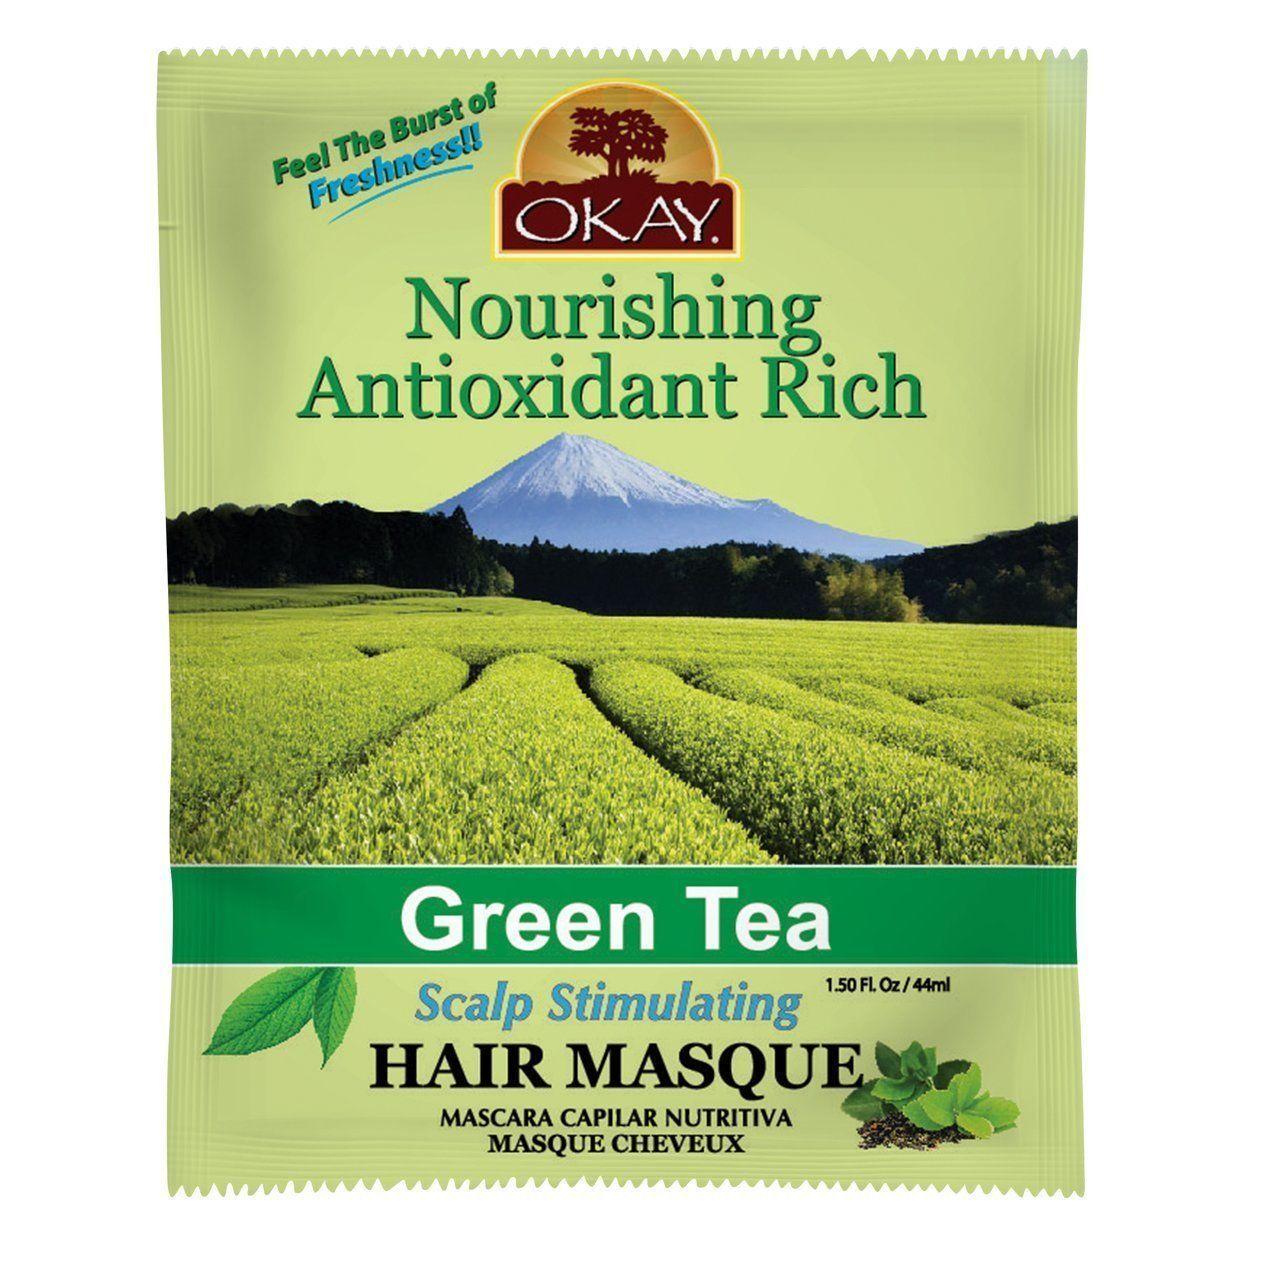 Okay Nourishing Antioxidant Rich Green Tea Scalp Stimulating Hair Masque 1.5oz